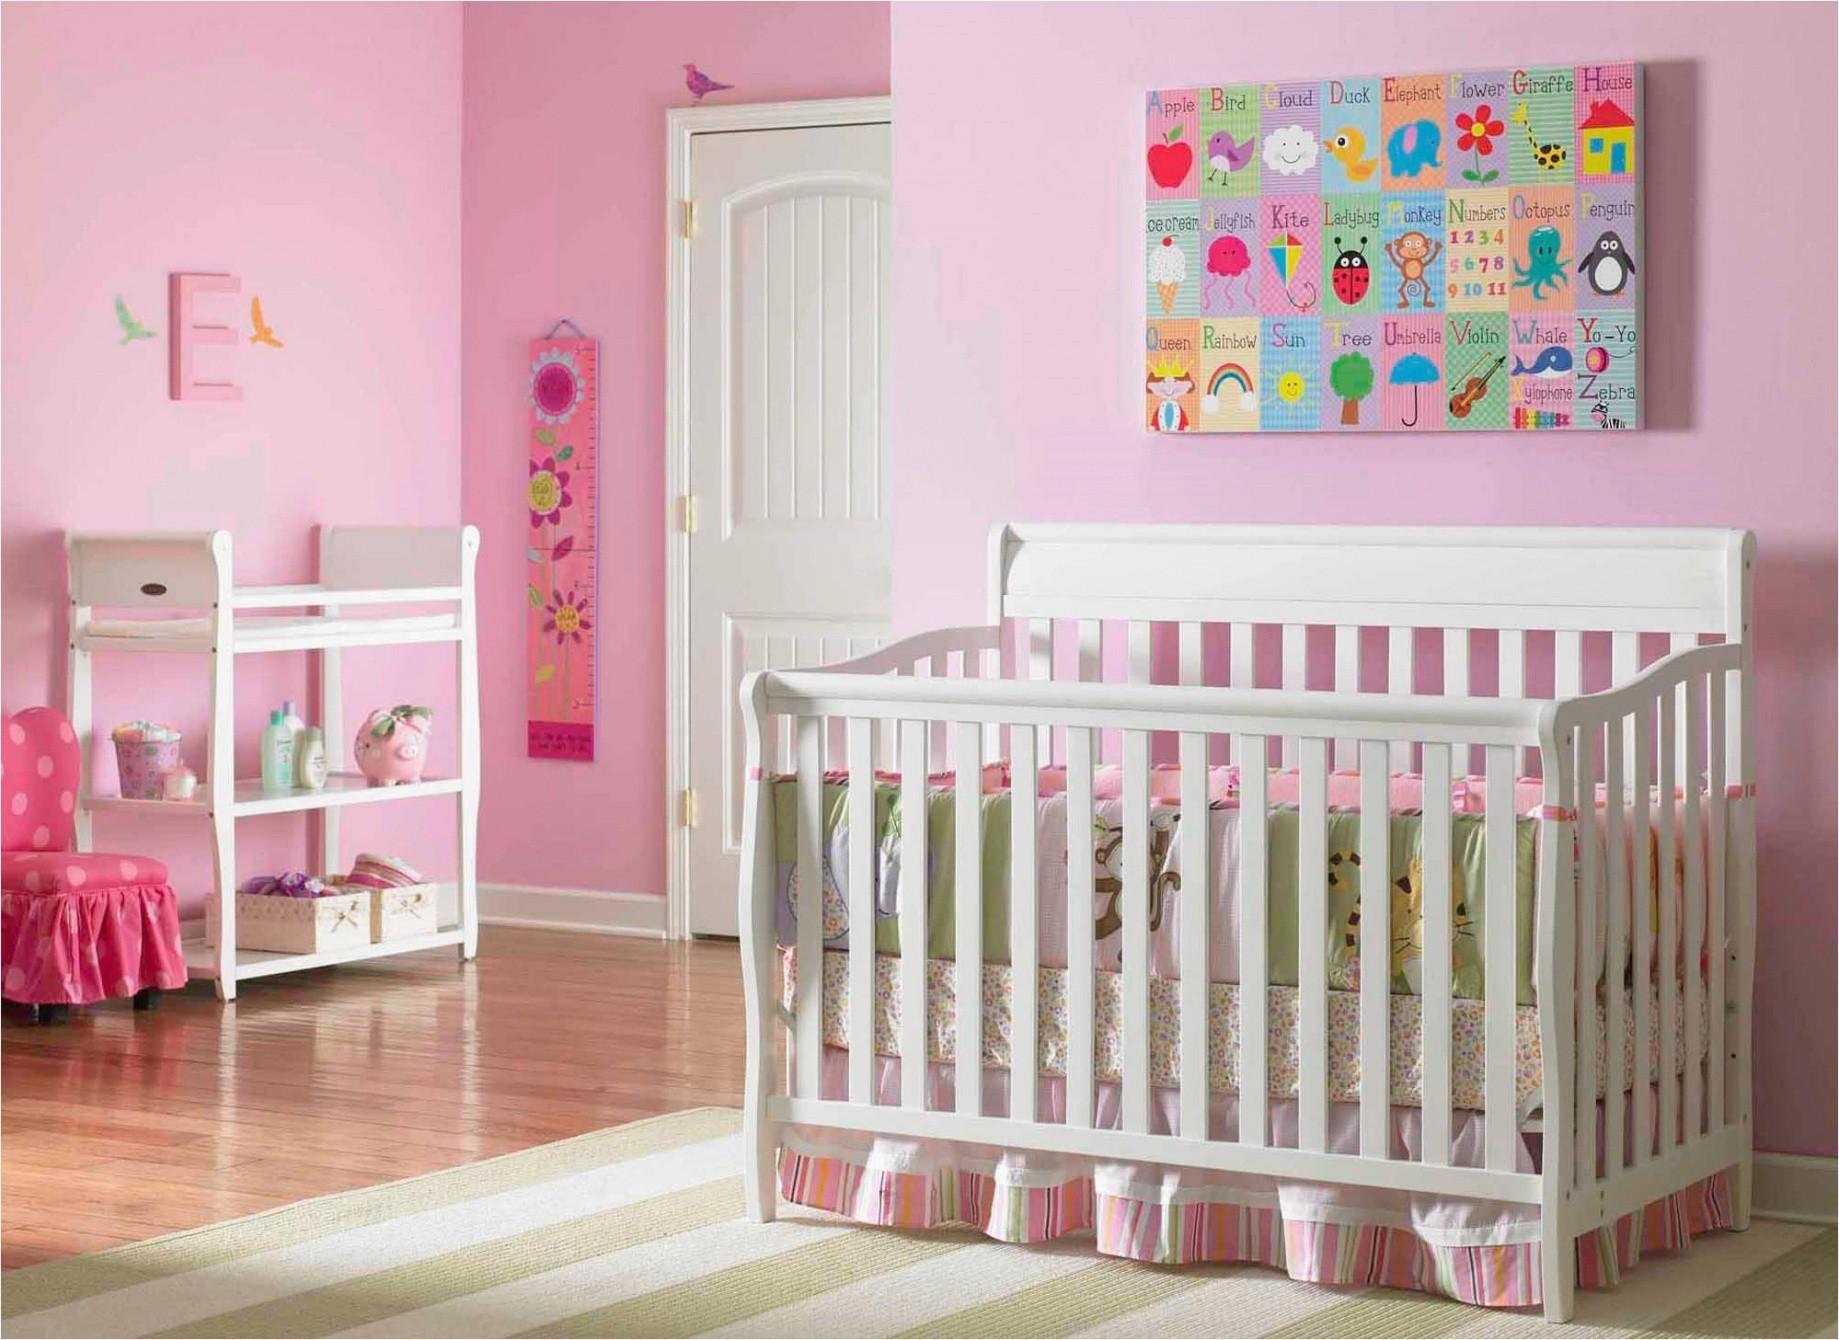 hardwood flooring regina of room decor regarding 40 fresh newborn baby room decoration ideas